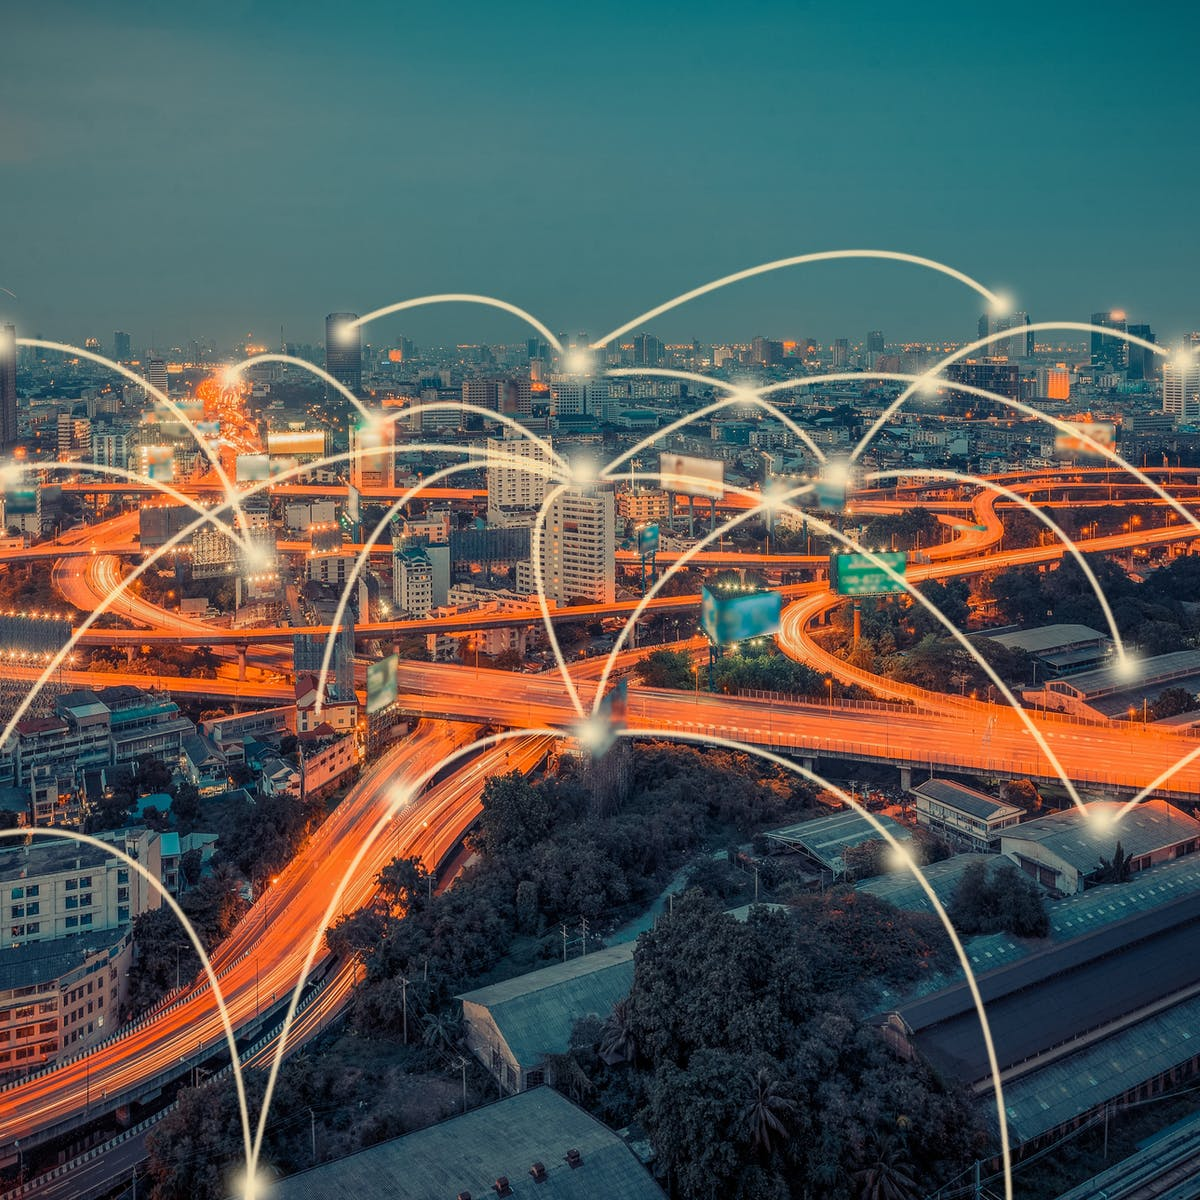 Titelbild-Skyline-Digital-Traffic-Vernetzung-iStock-621358098-cofotoisme